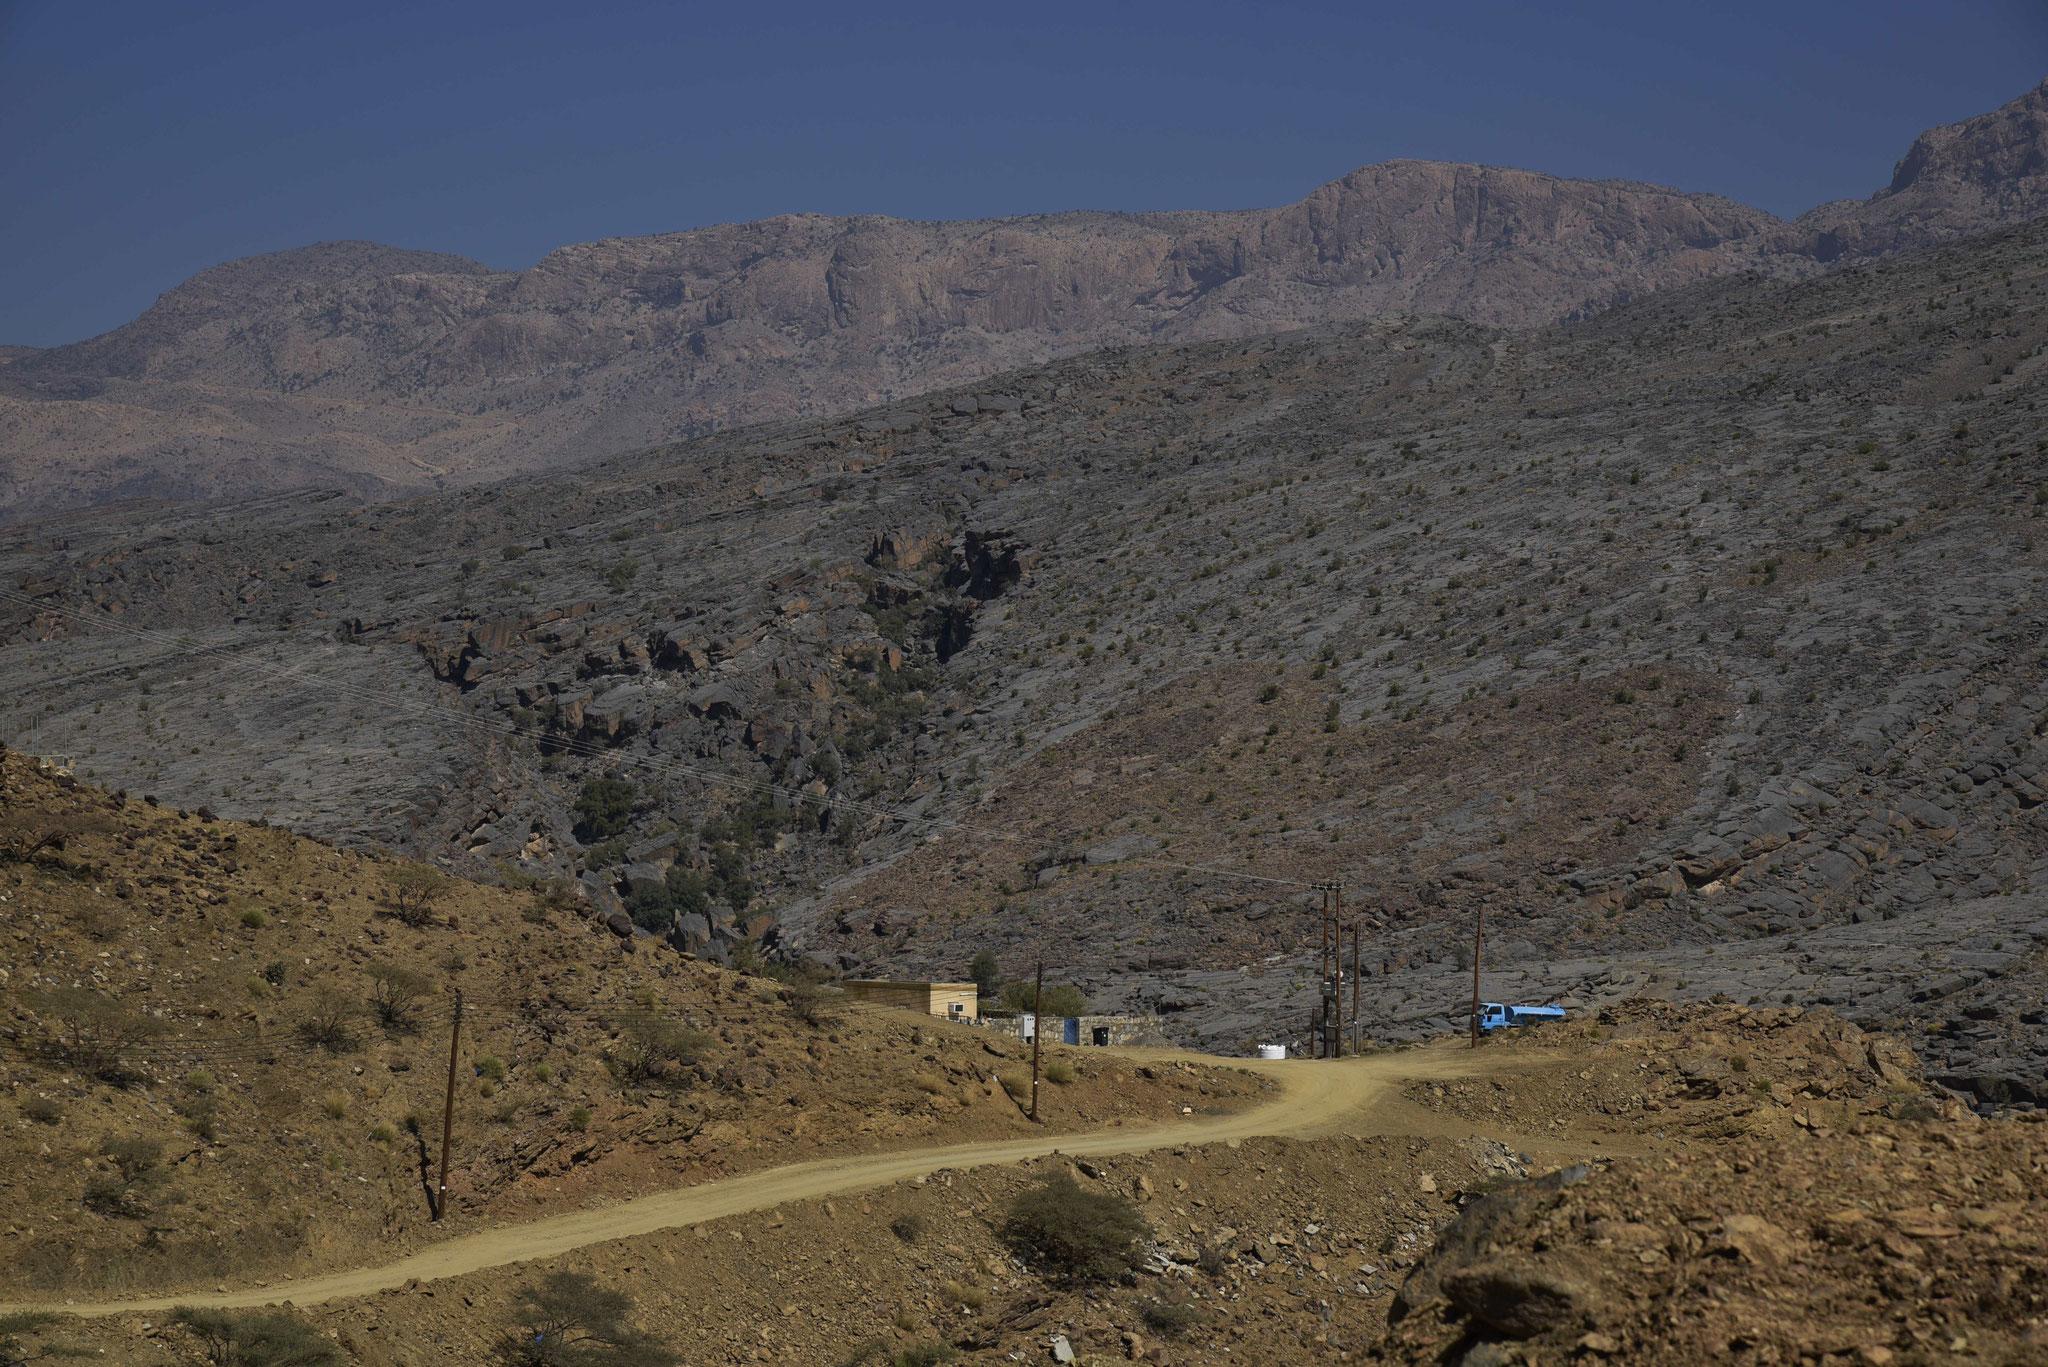 Auf dem Weg zum Jebel Shams VII